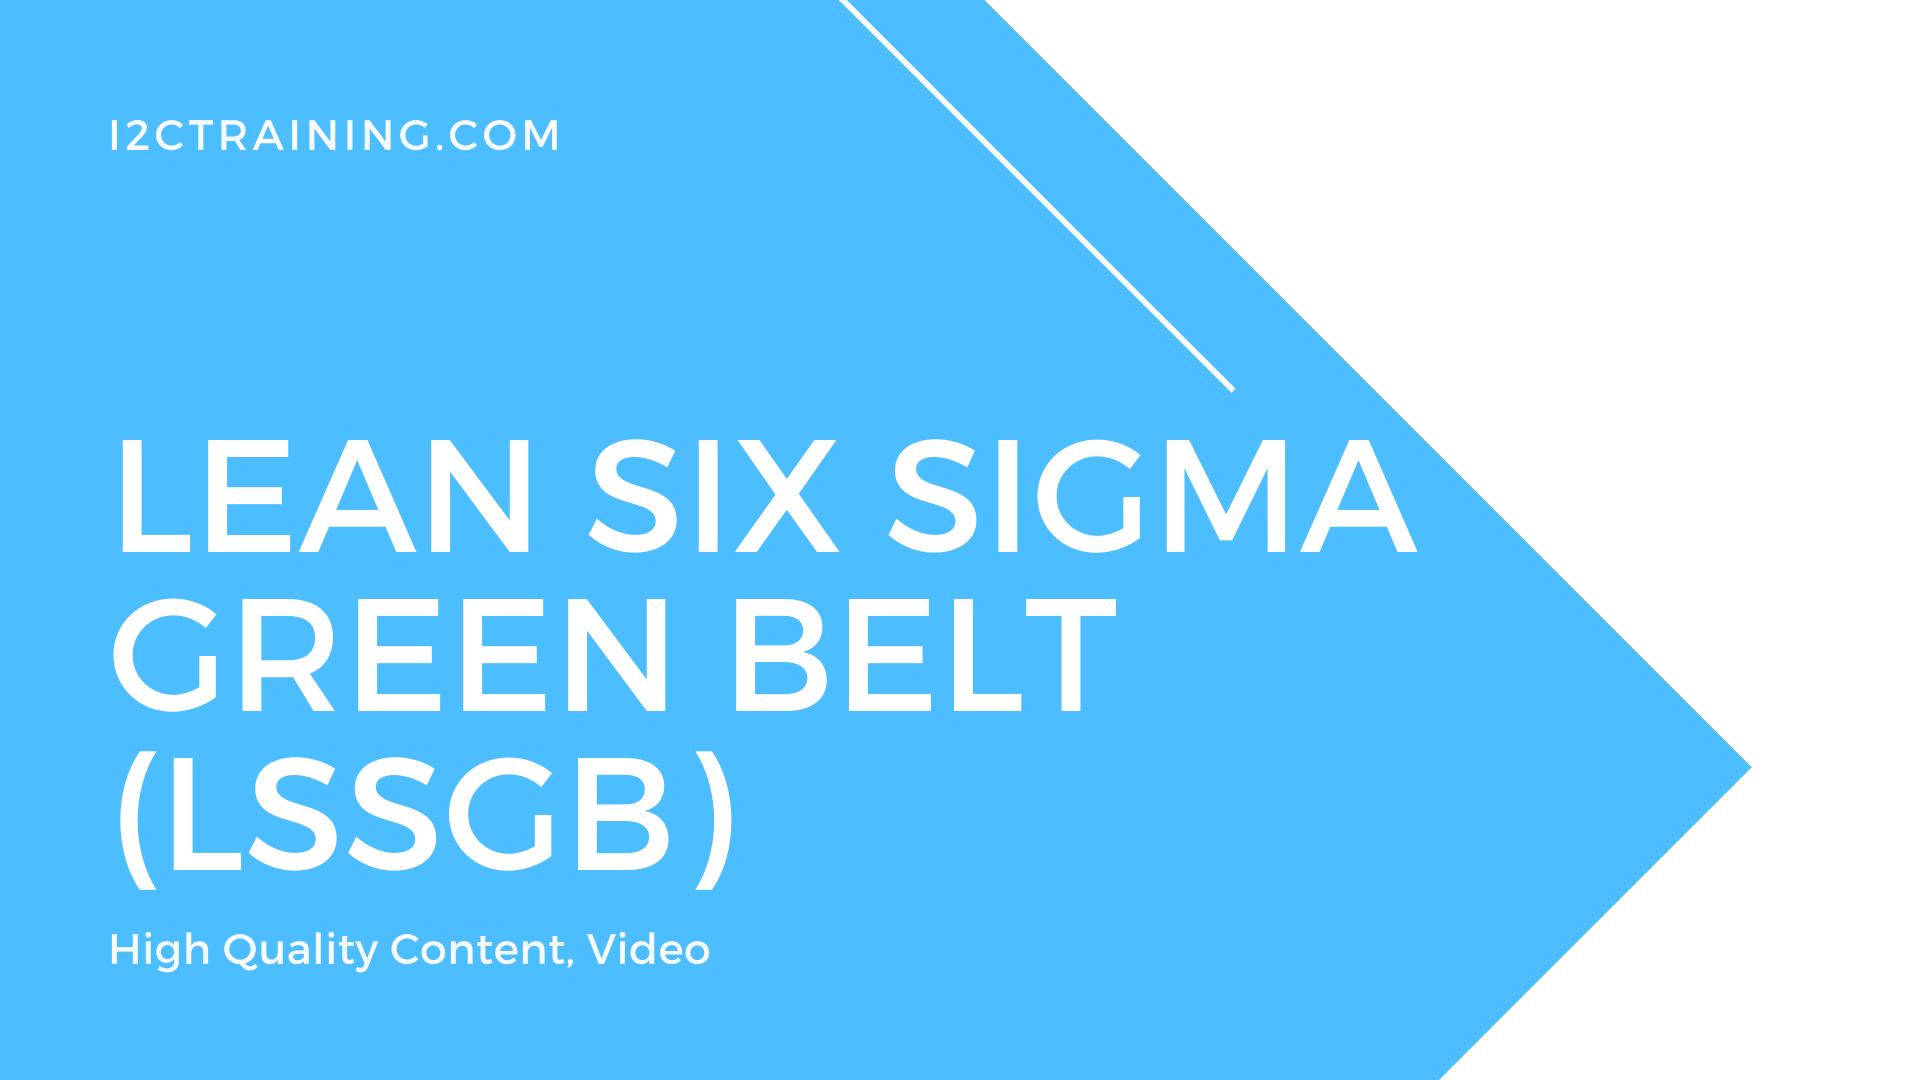 Lean Six Sigma Green Belt (LSSGB)